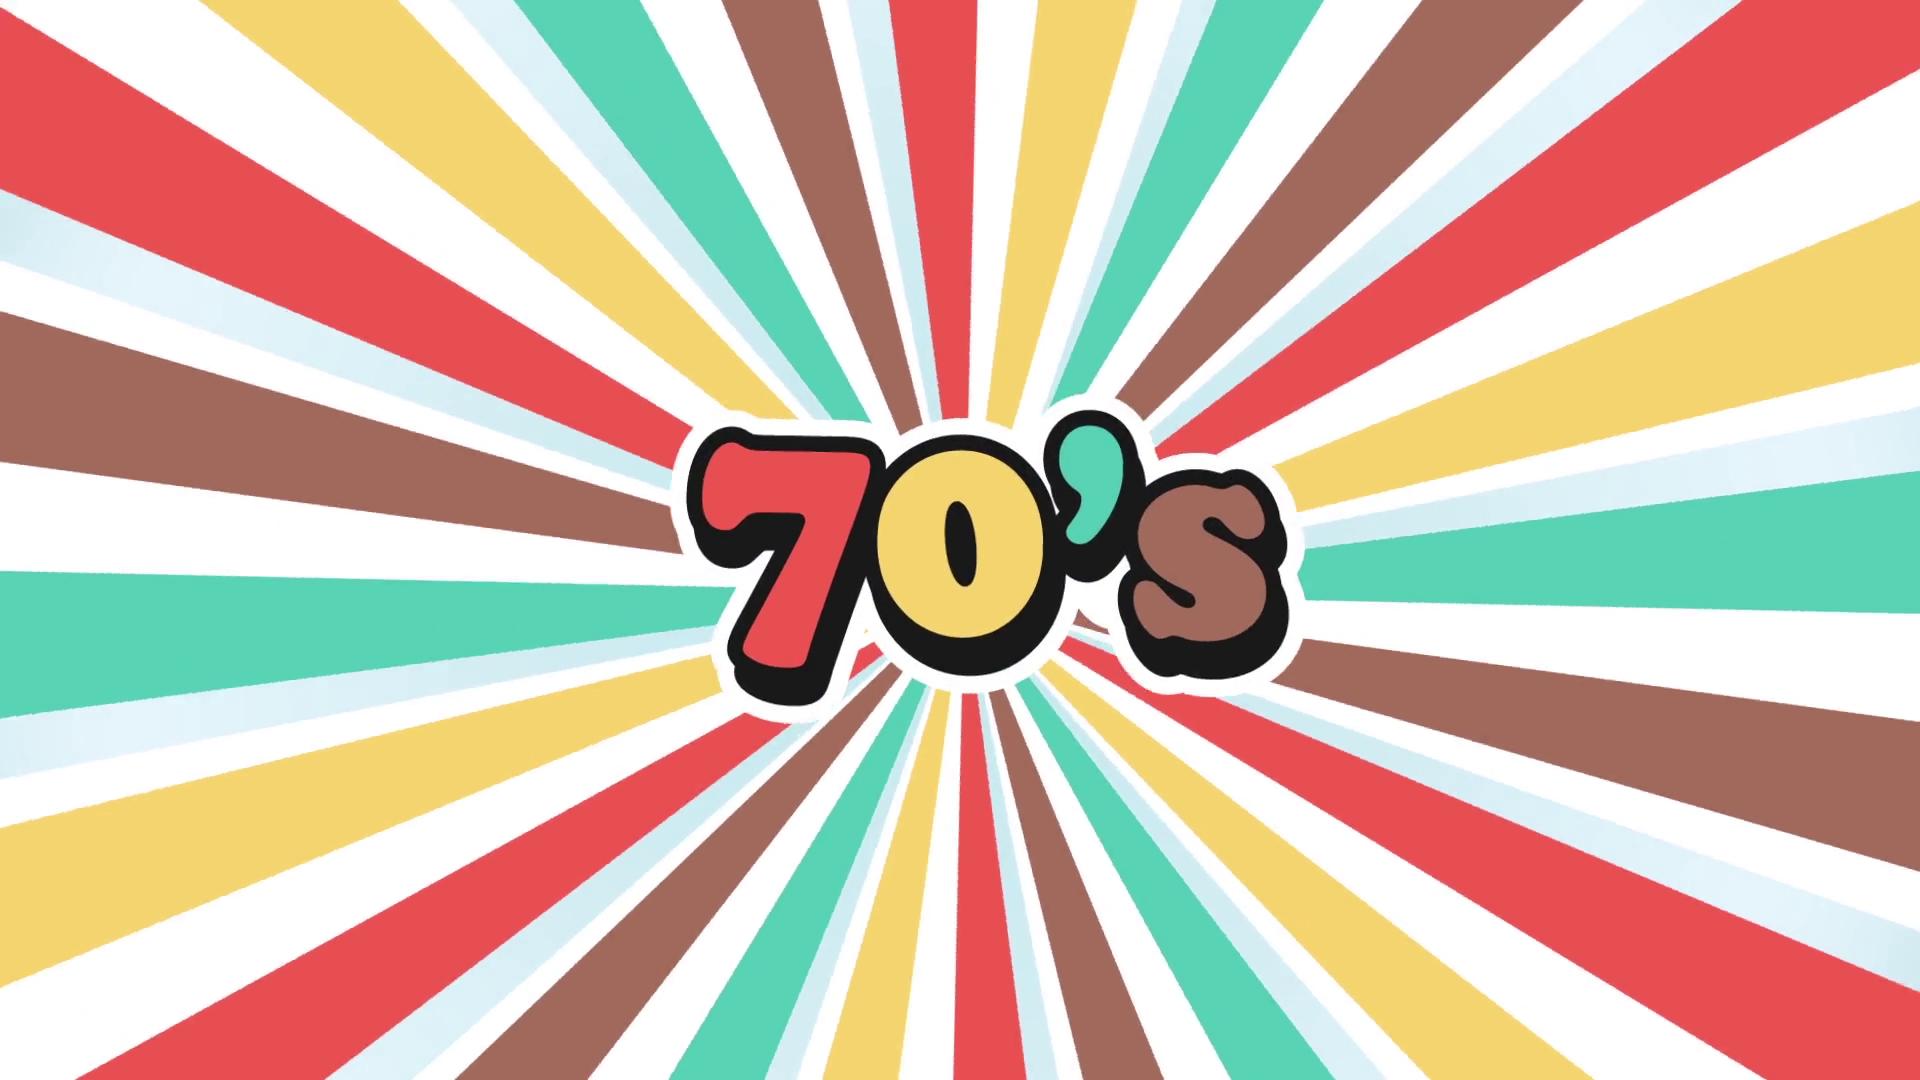 70s Logo Sunburst Vintage Background. Video Animation